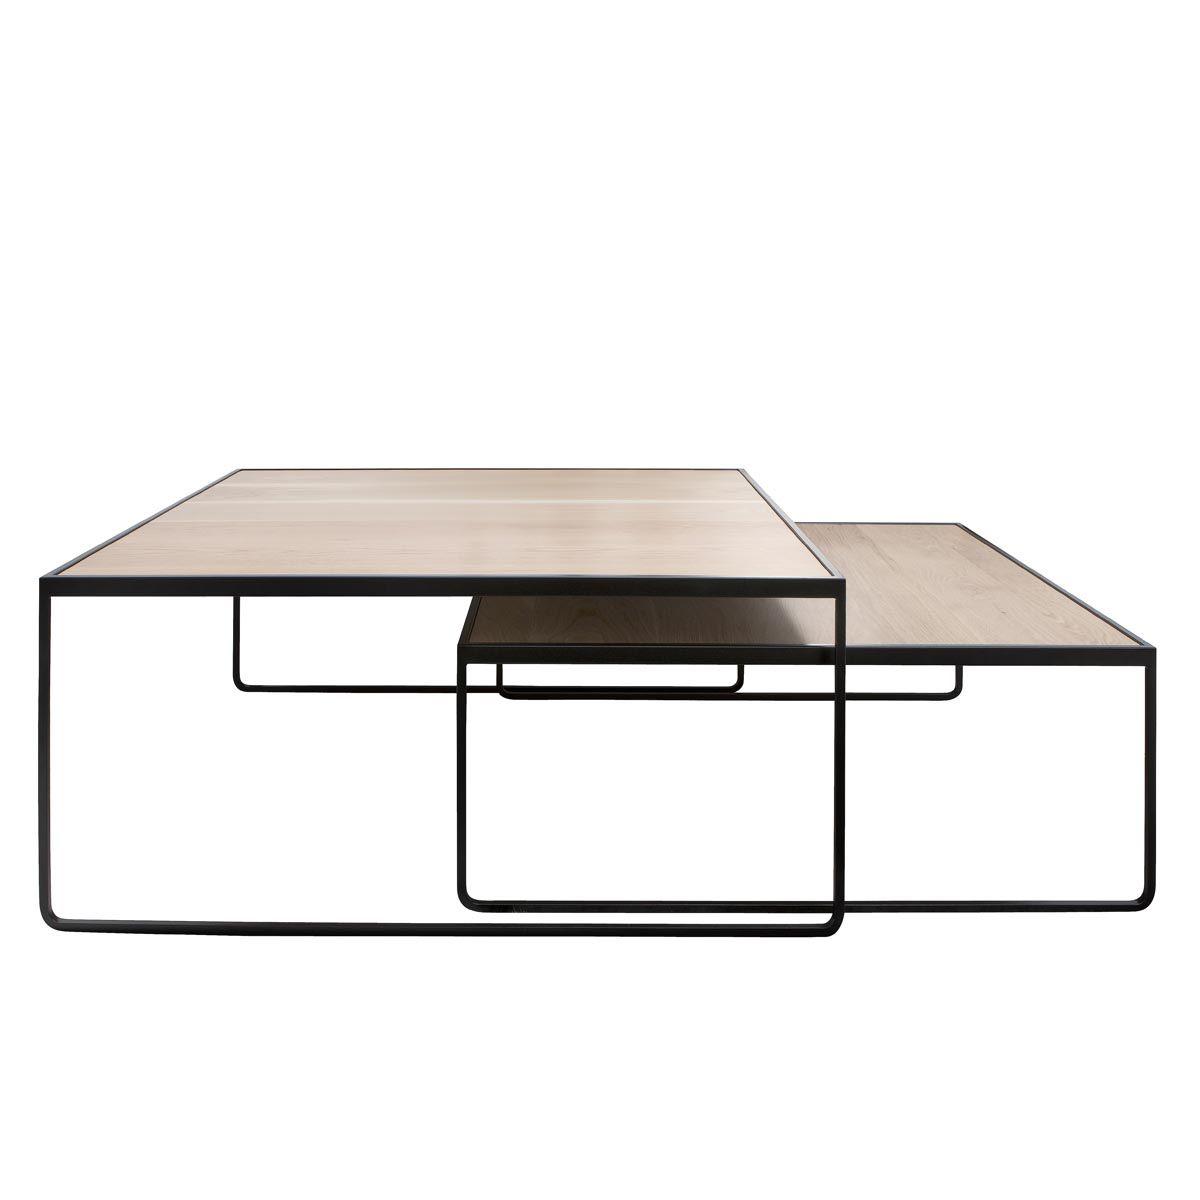 Fantastic Oak And Steel Stacking Coffee Table Furniture In 2019 Inzonedesignstudio Interior Chair Design Inzonedesignstudiocom